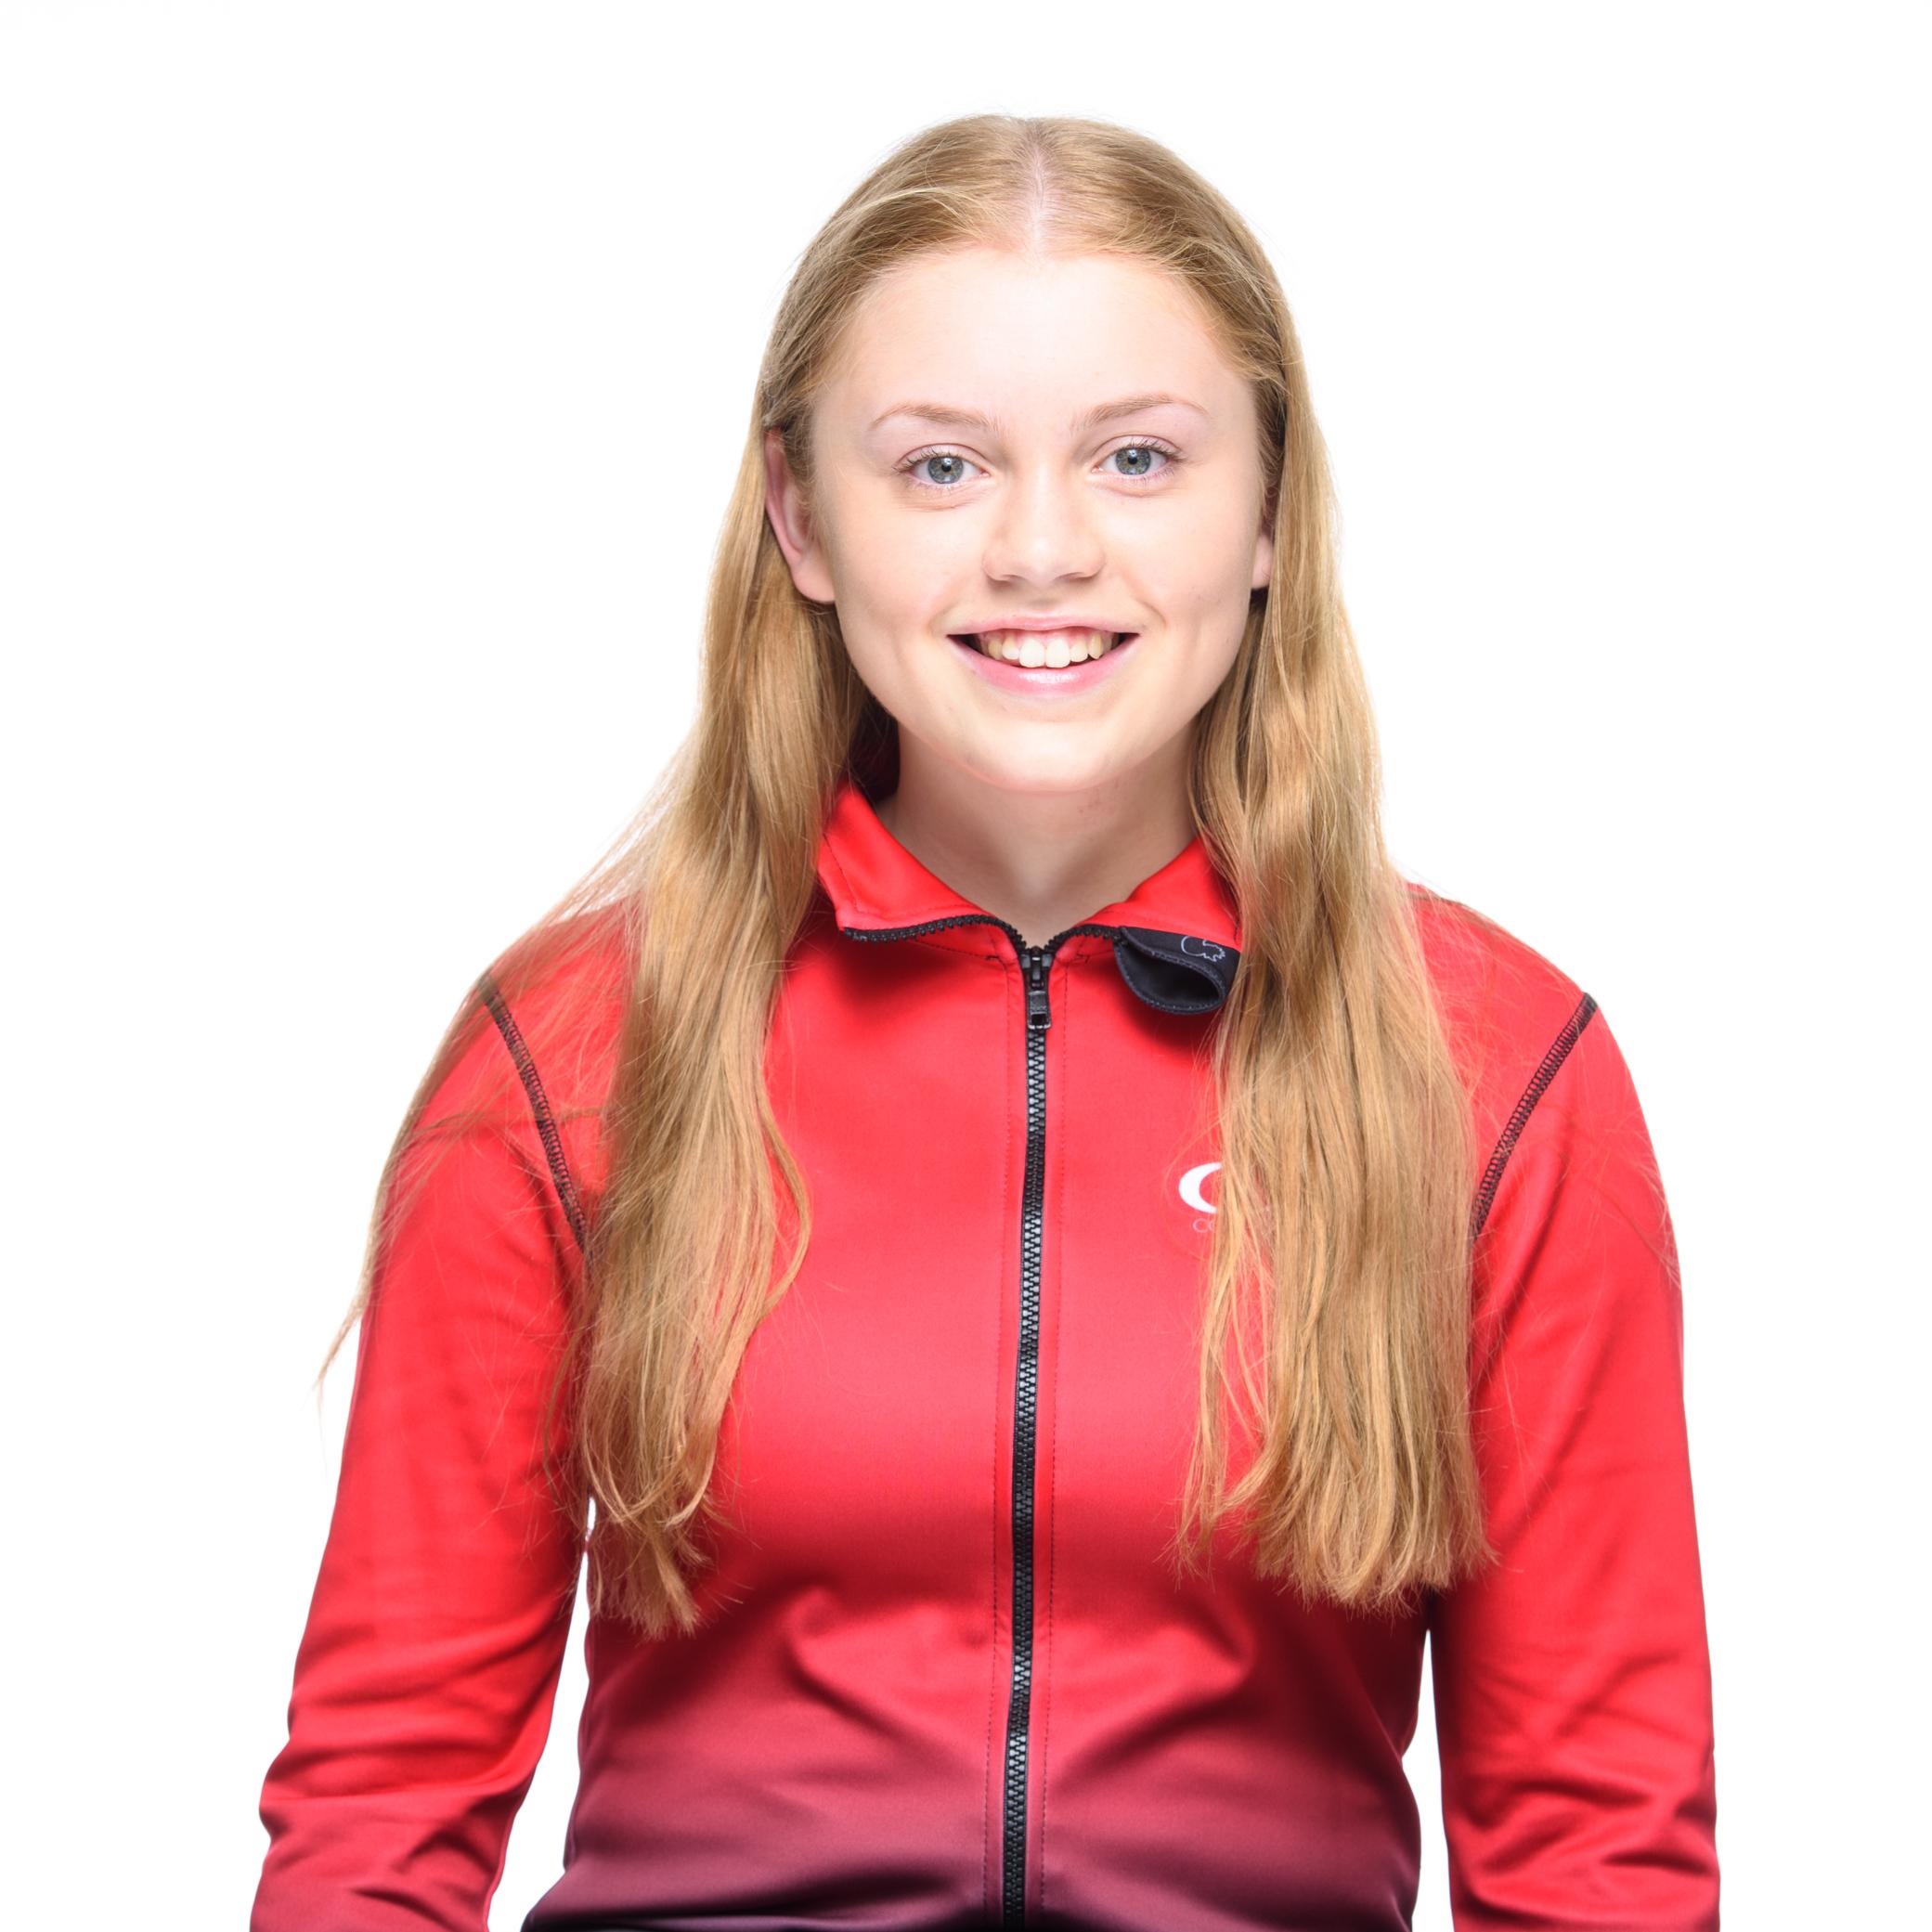 Nicole Upton